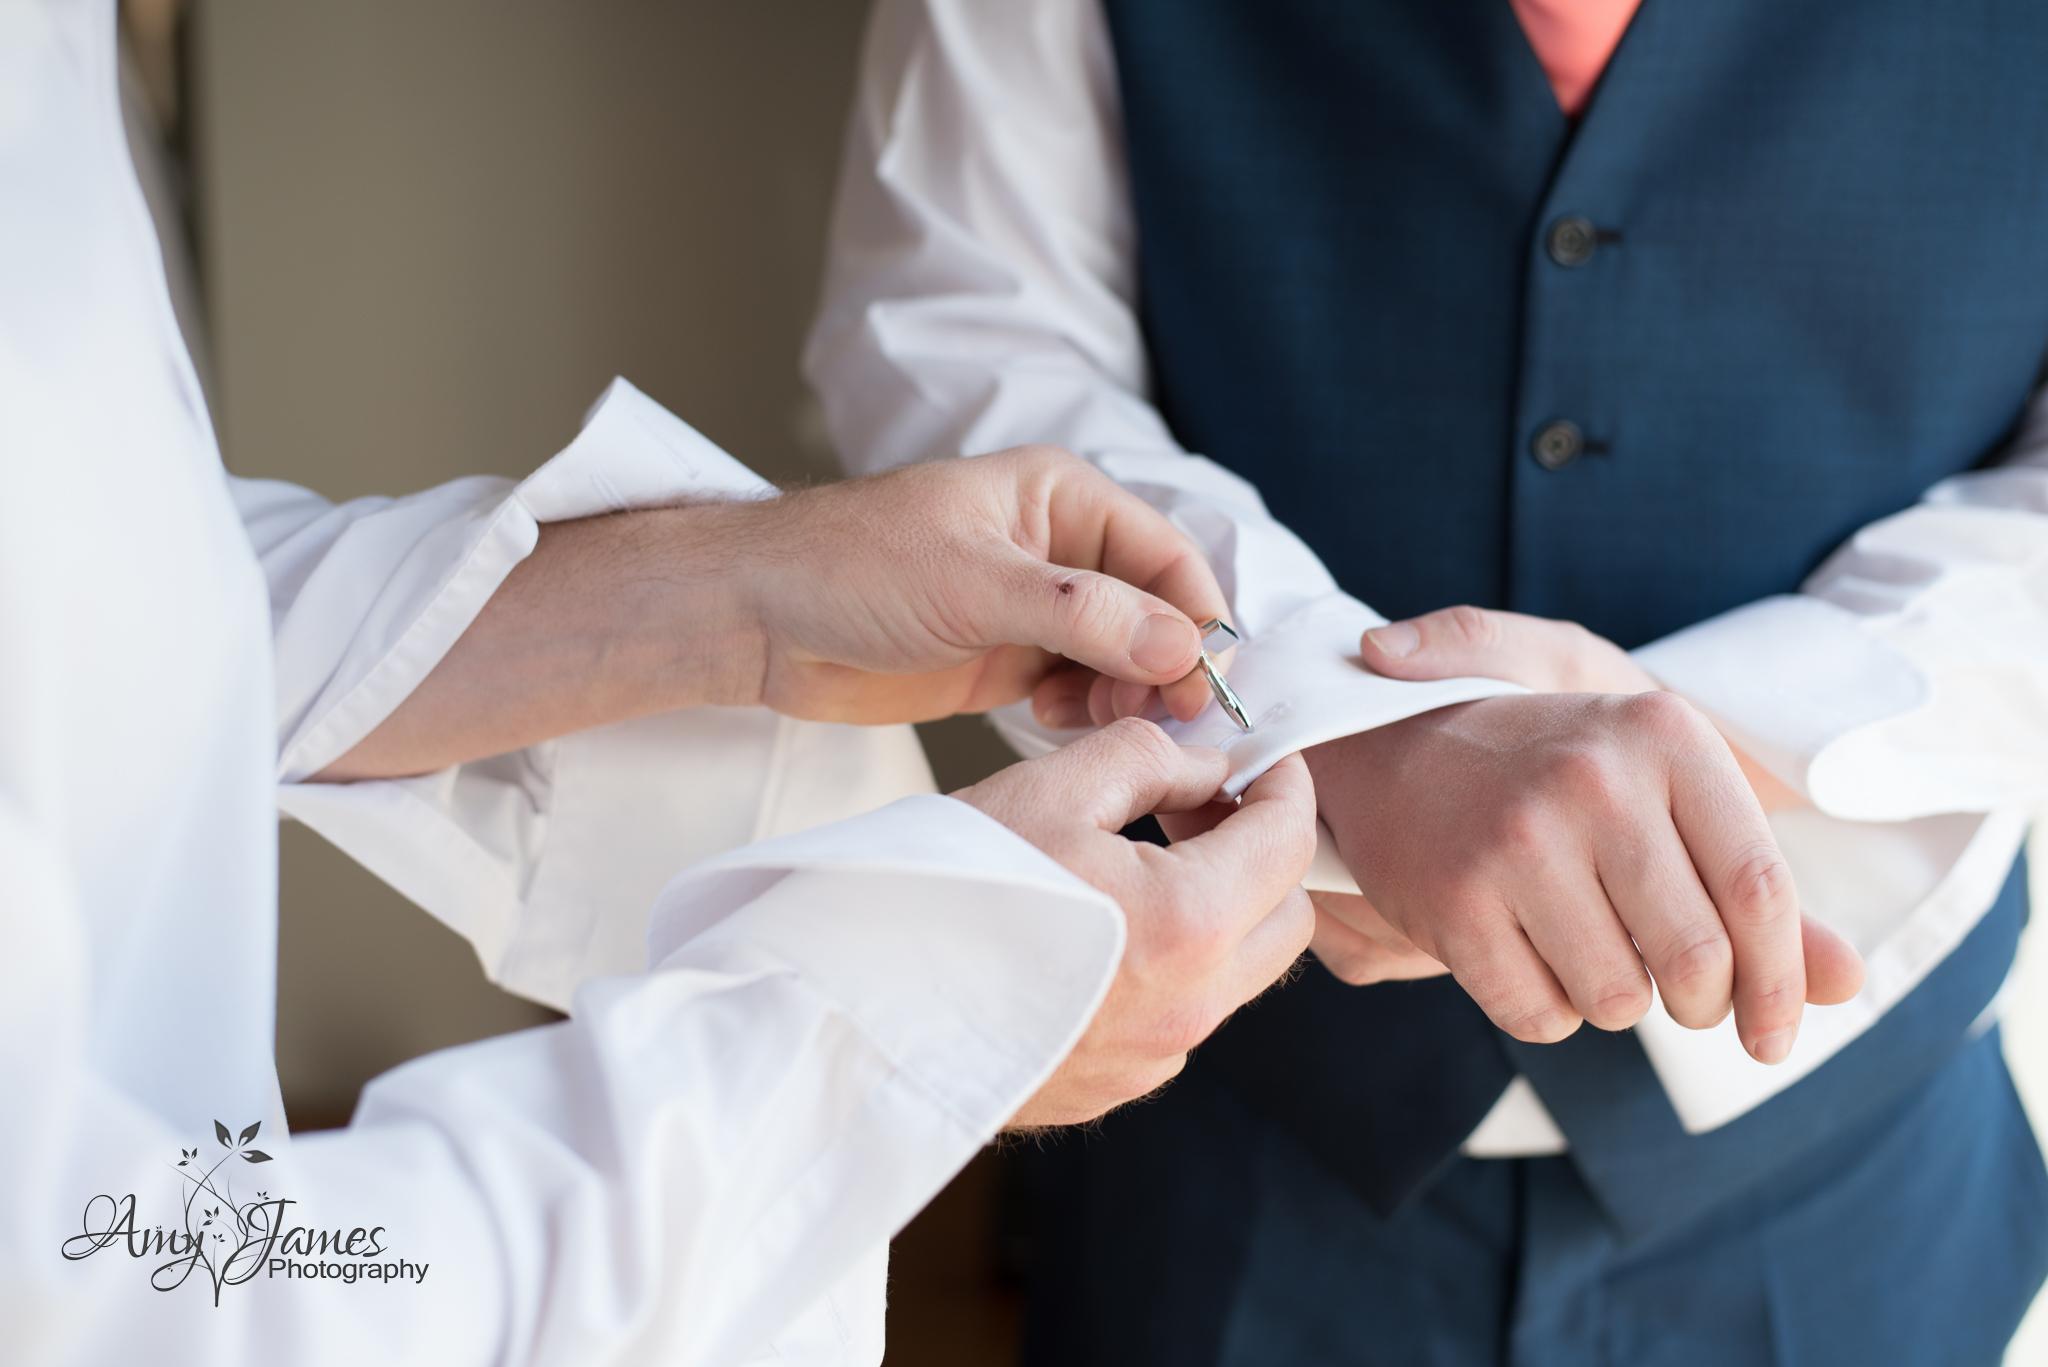 Frimley Hall Hotel wedding photographer // Hampsire wedding photographer // Fleet wedding photographer